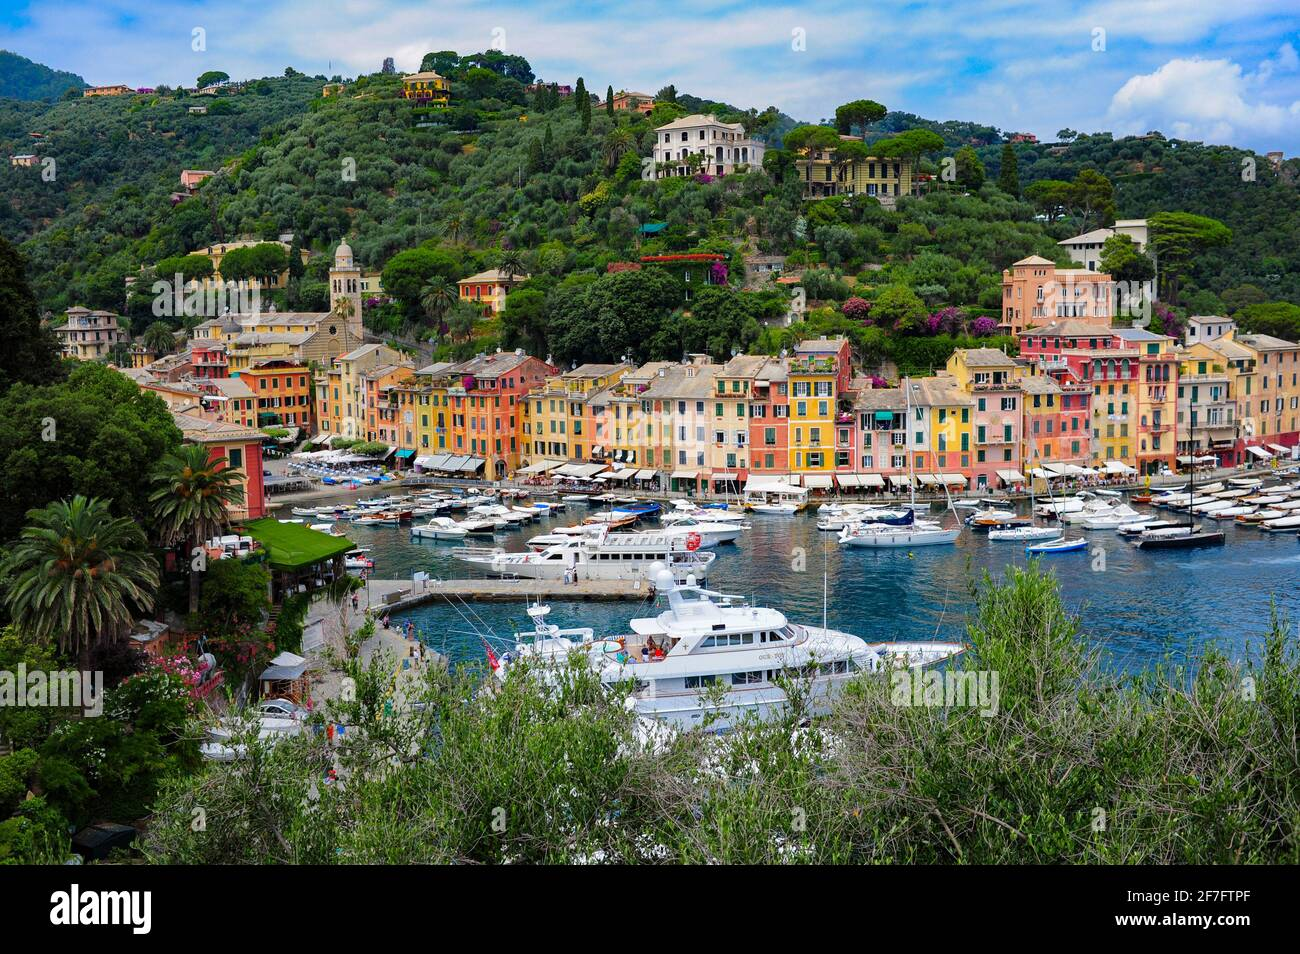 europe-italy-portofino-liguria-the-colorful-port-on-the-mediterranean-sea-2F7FTPF.jpg